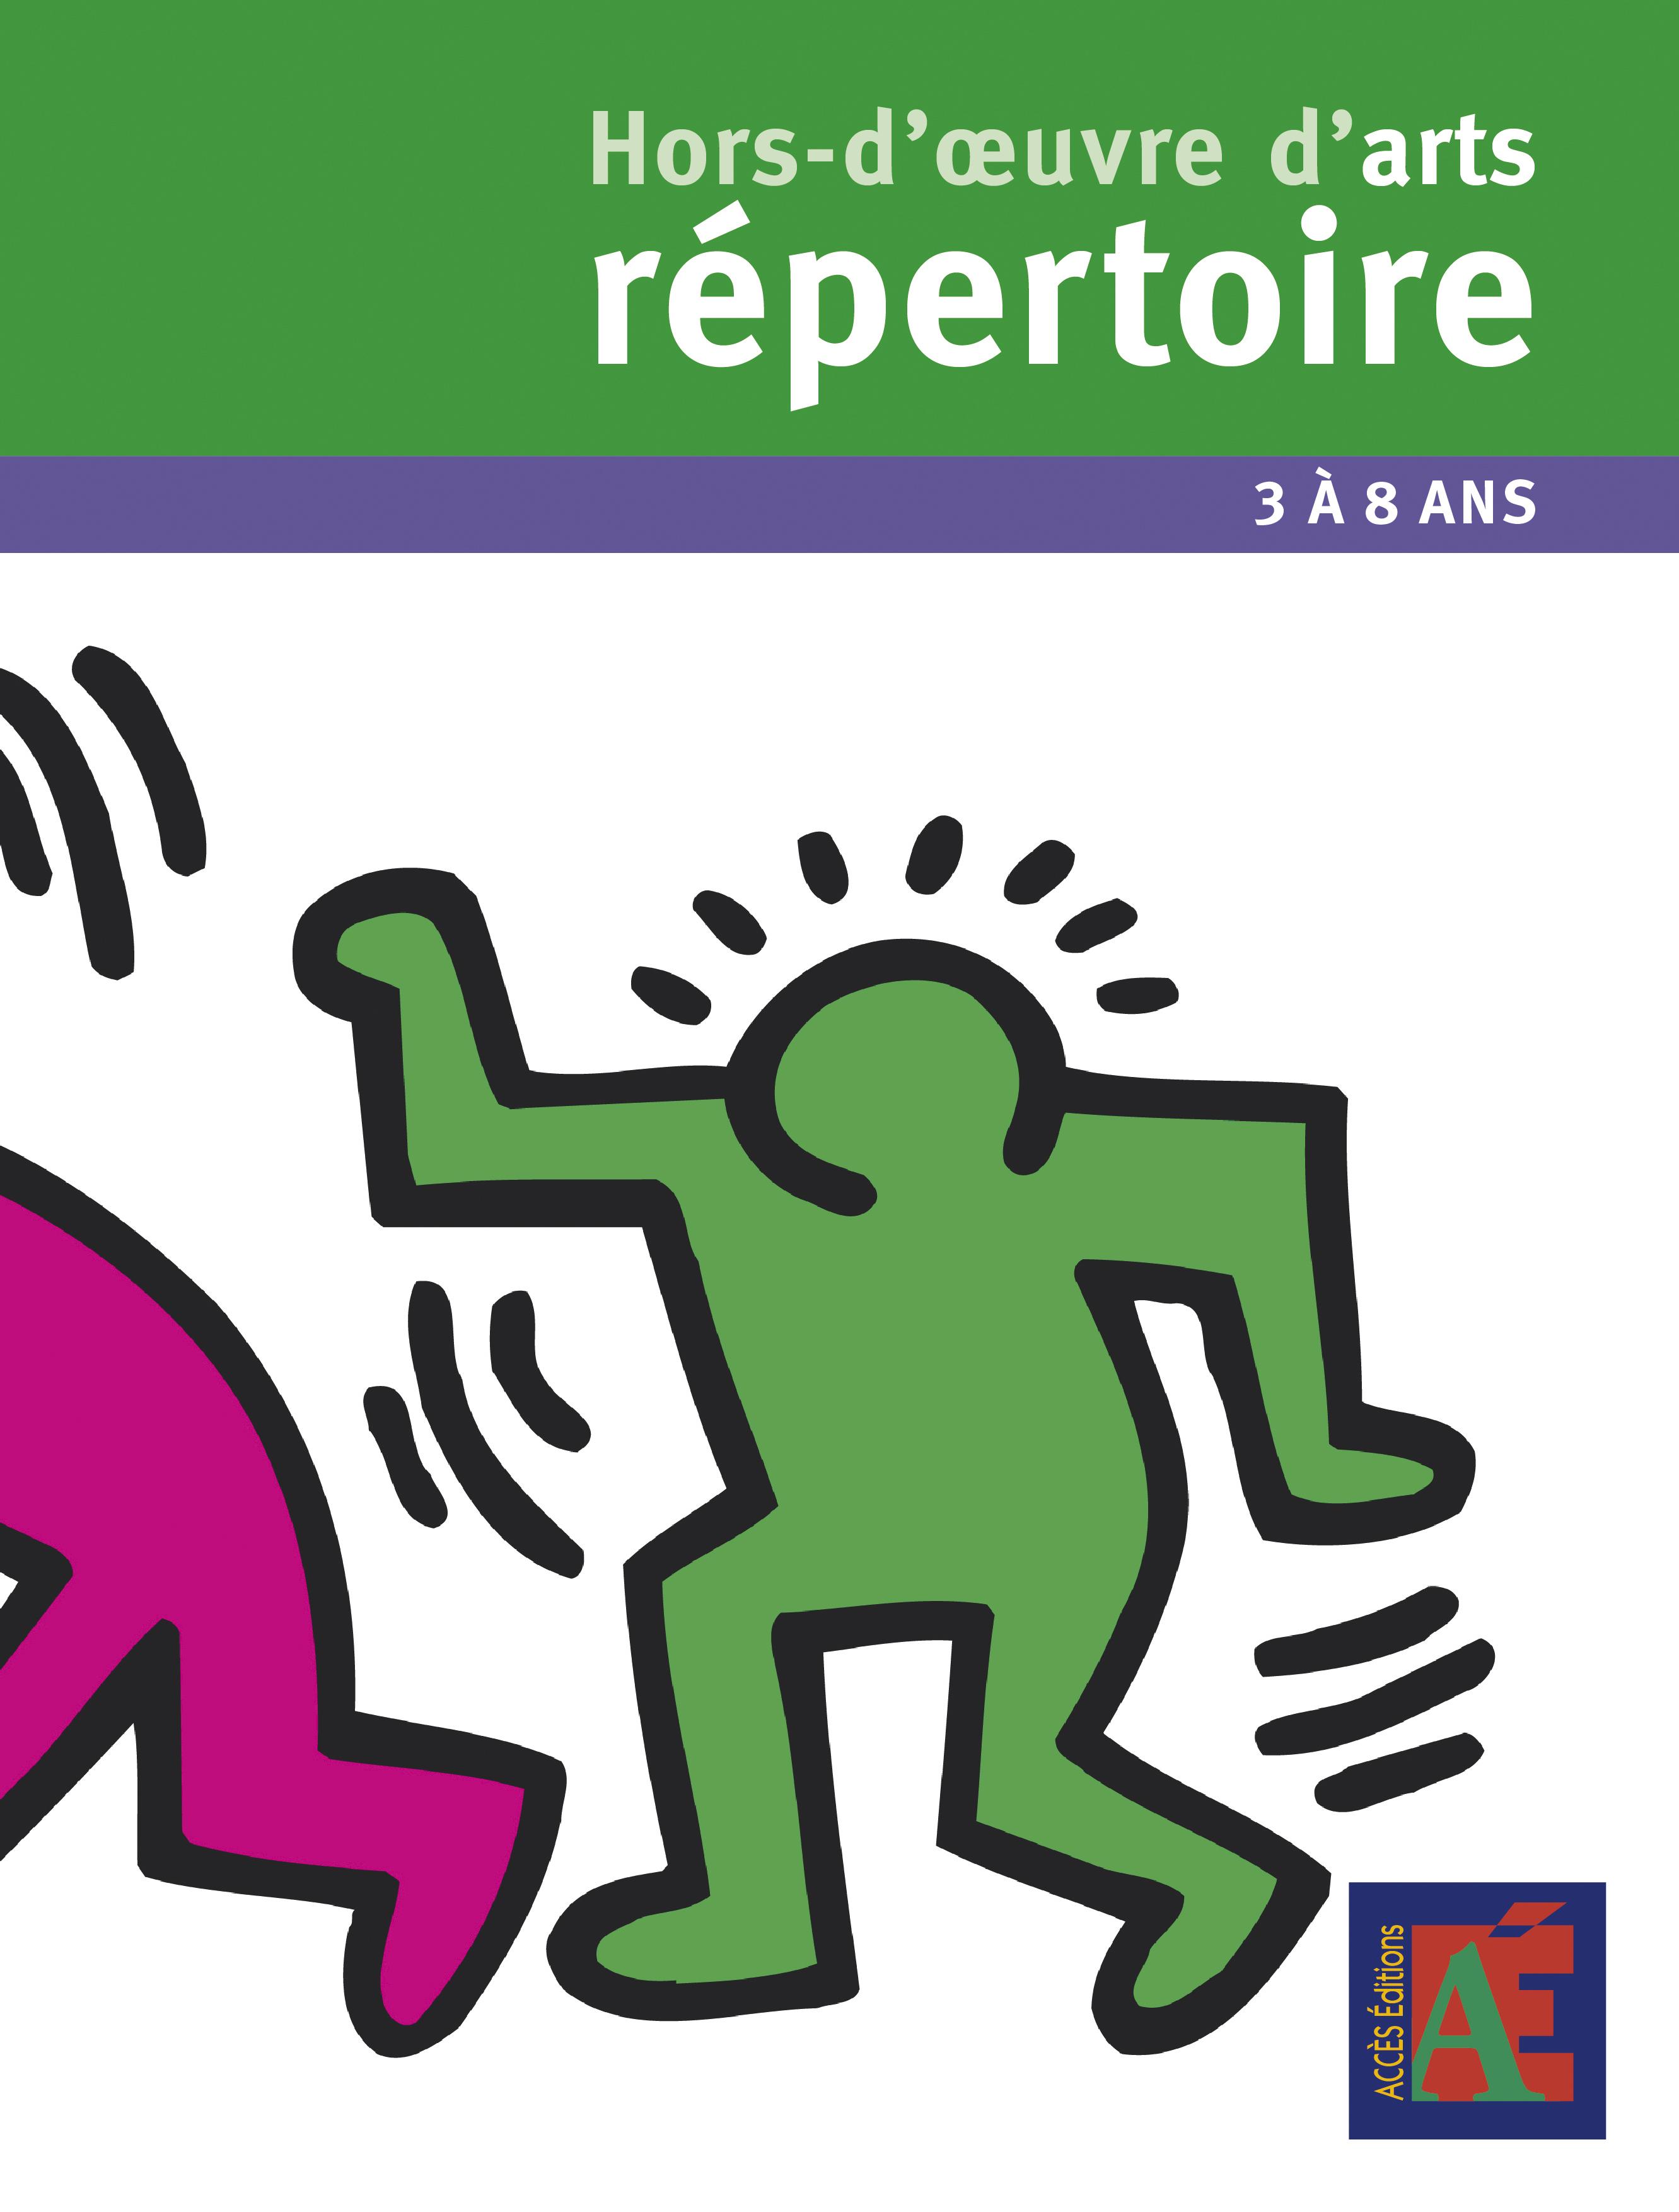 HORS-D'OEUVRE D'ARTS REPERTOIRE